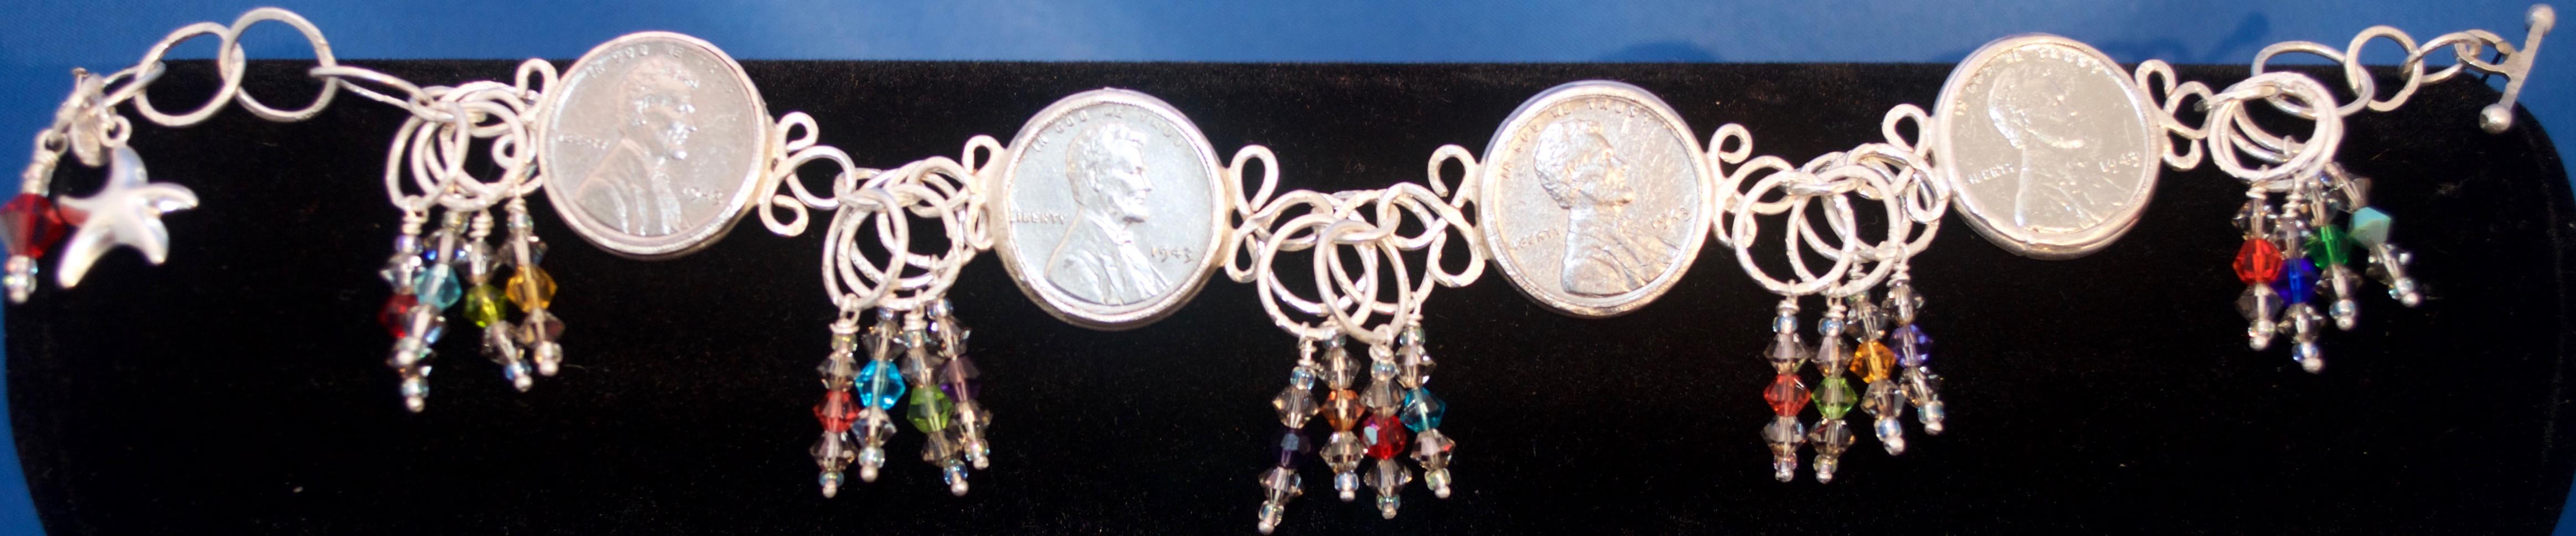 Steel Pennies and Swarovski Crystal Bracelet